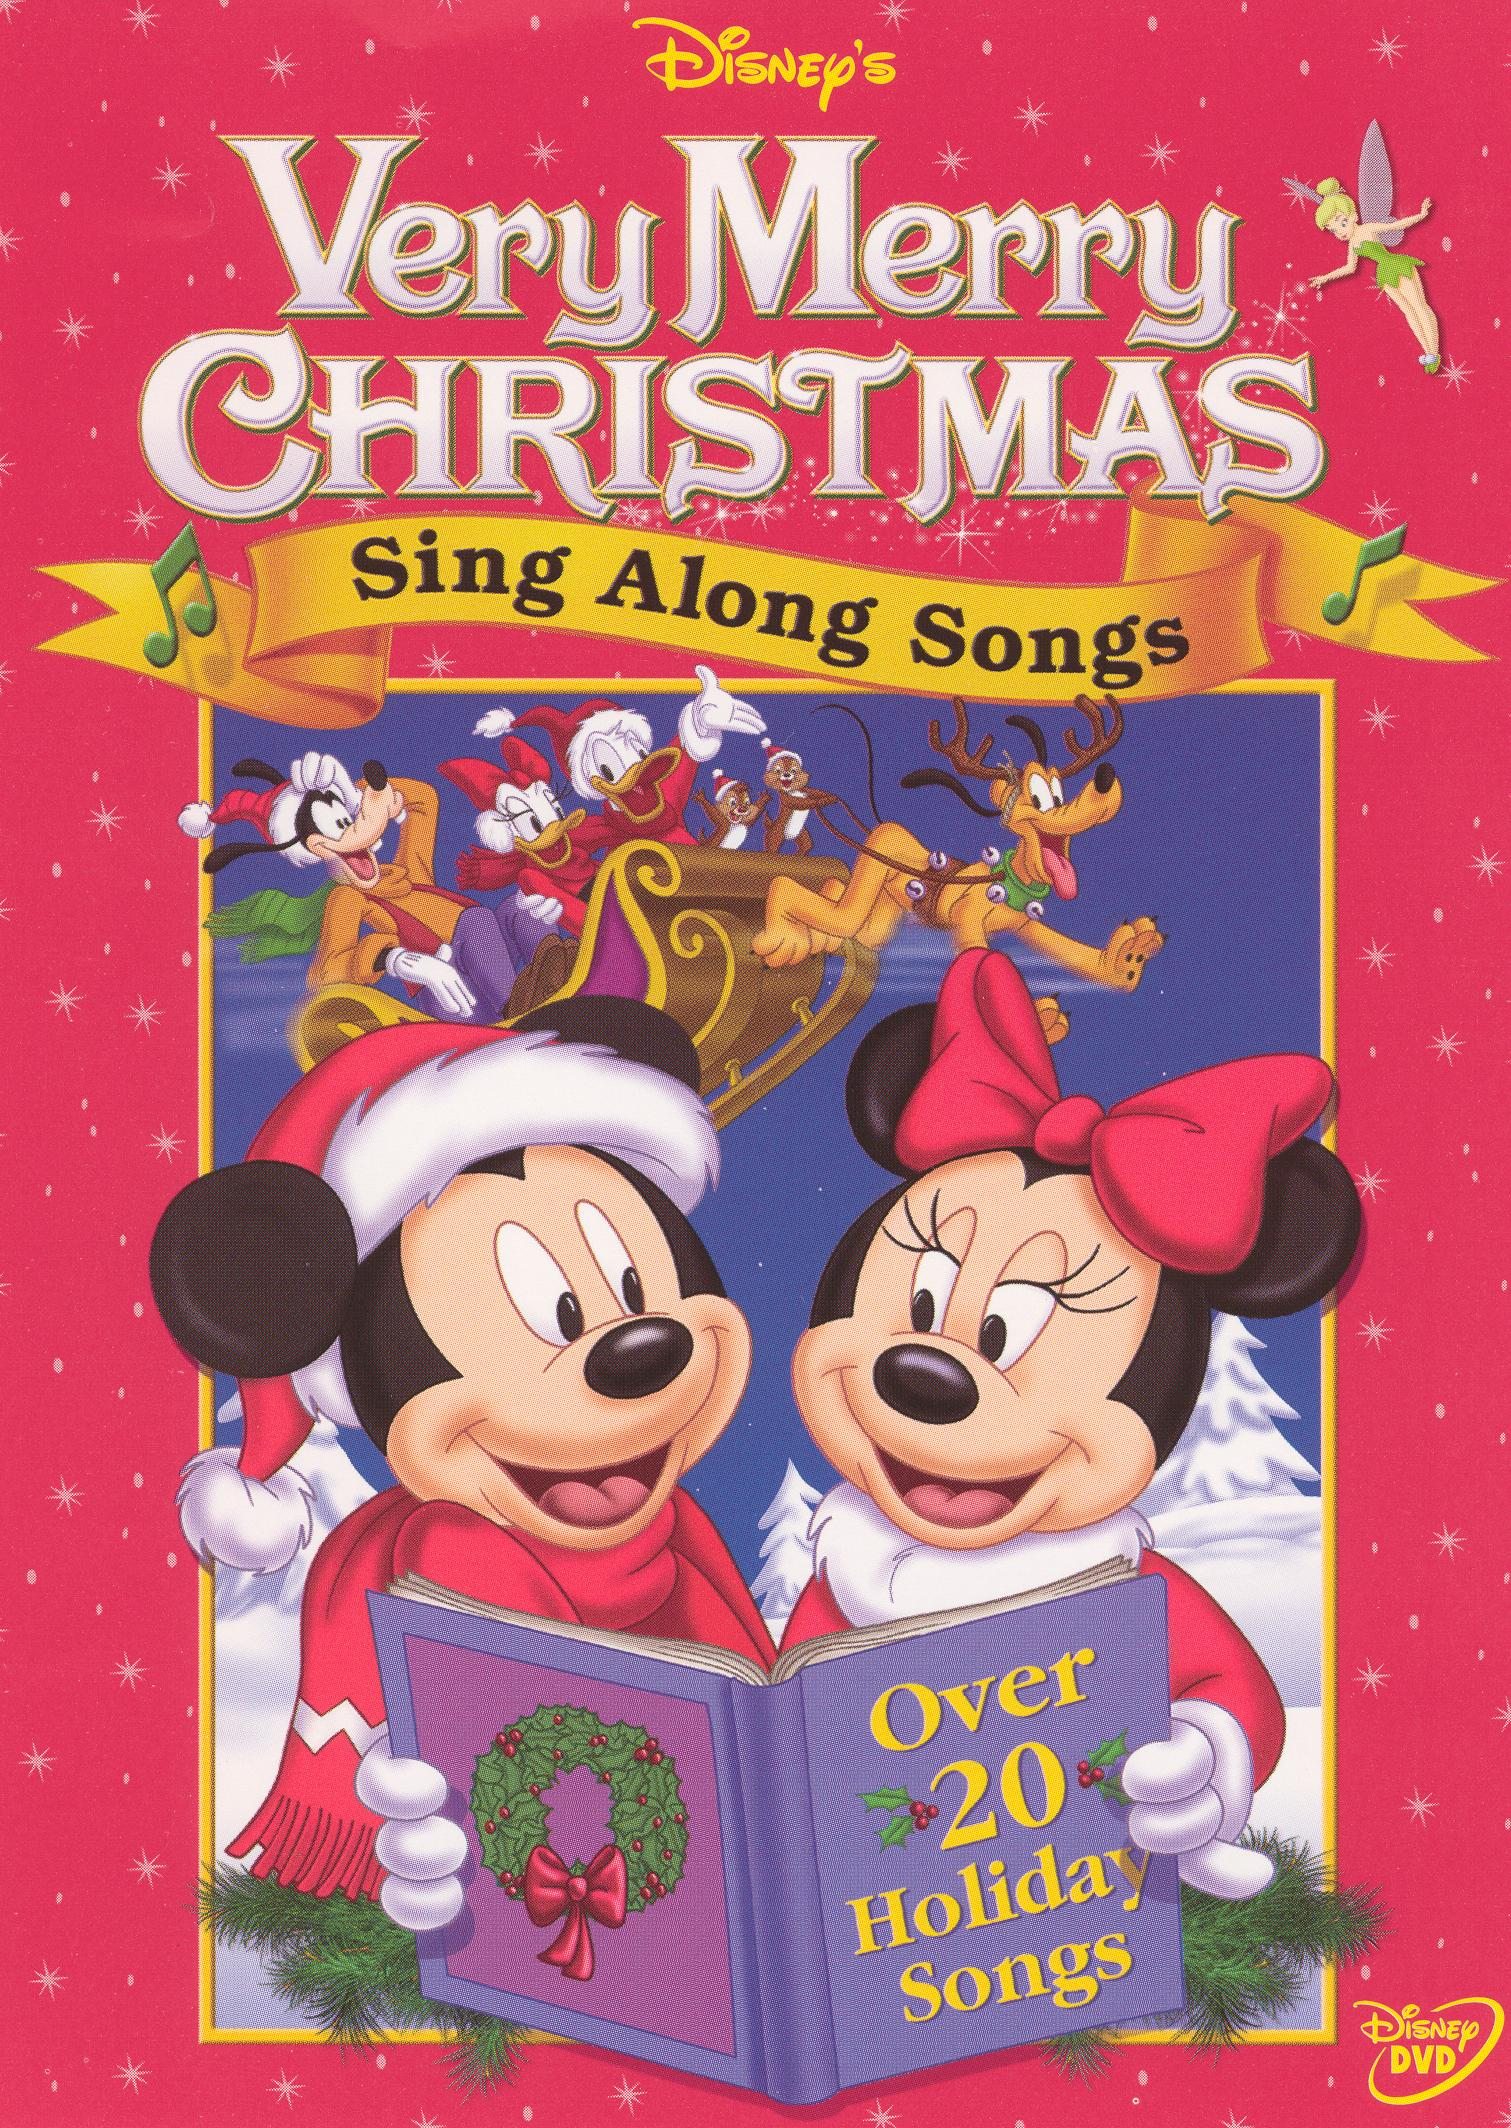 Disney's Sing Along Songs: Very Merry Christmas Songs (1988) - | Releases | AllMovie